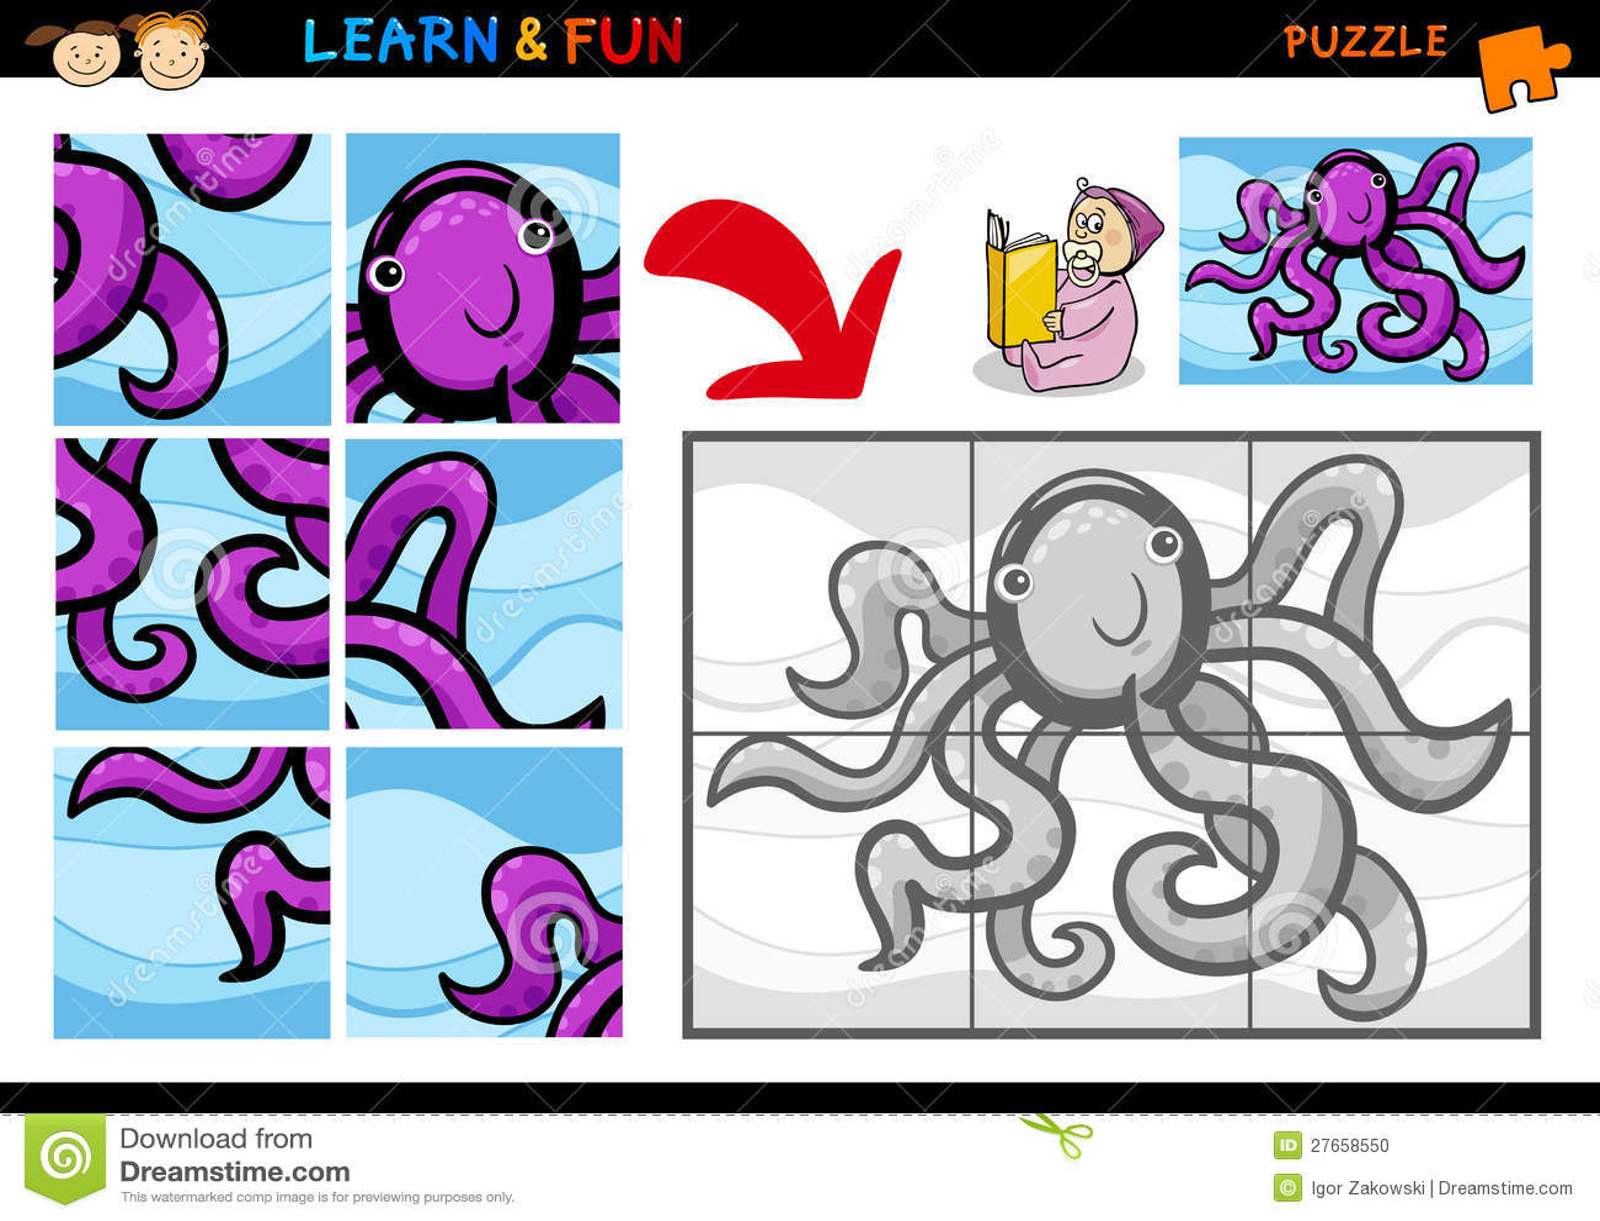 Cute Animal Africa Jungle Illustration further Cartoon Lion as well Cute Cartoon Zebra Illustration Funny further Cartoon Octopus Puzzle Game moreover Baby Zebra Clipart. on zebra cartoon clipart